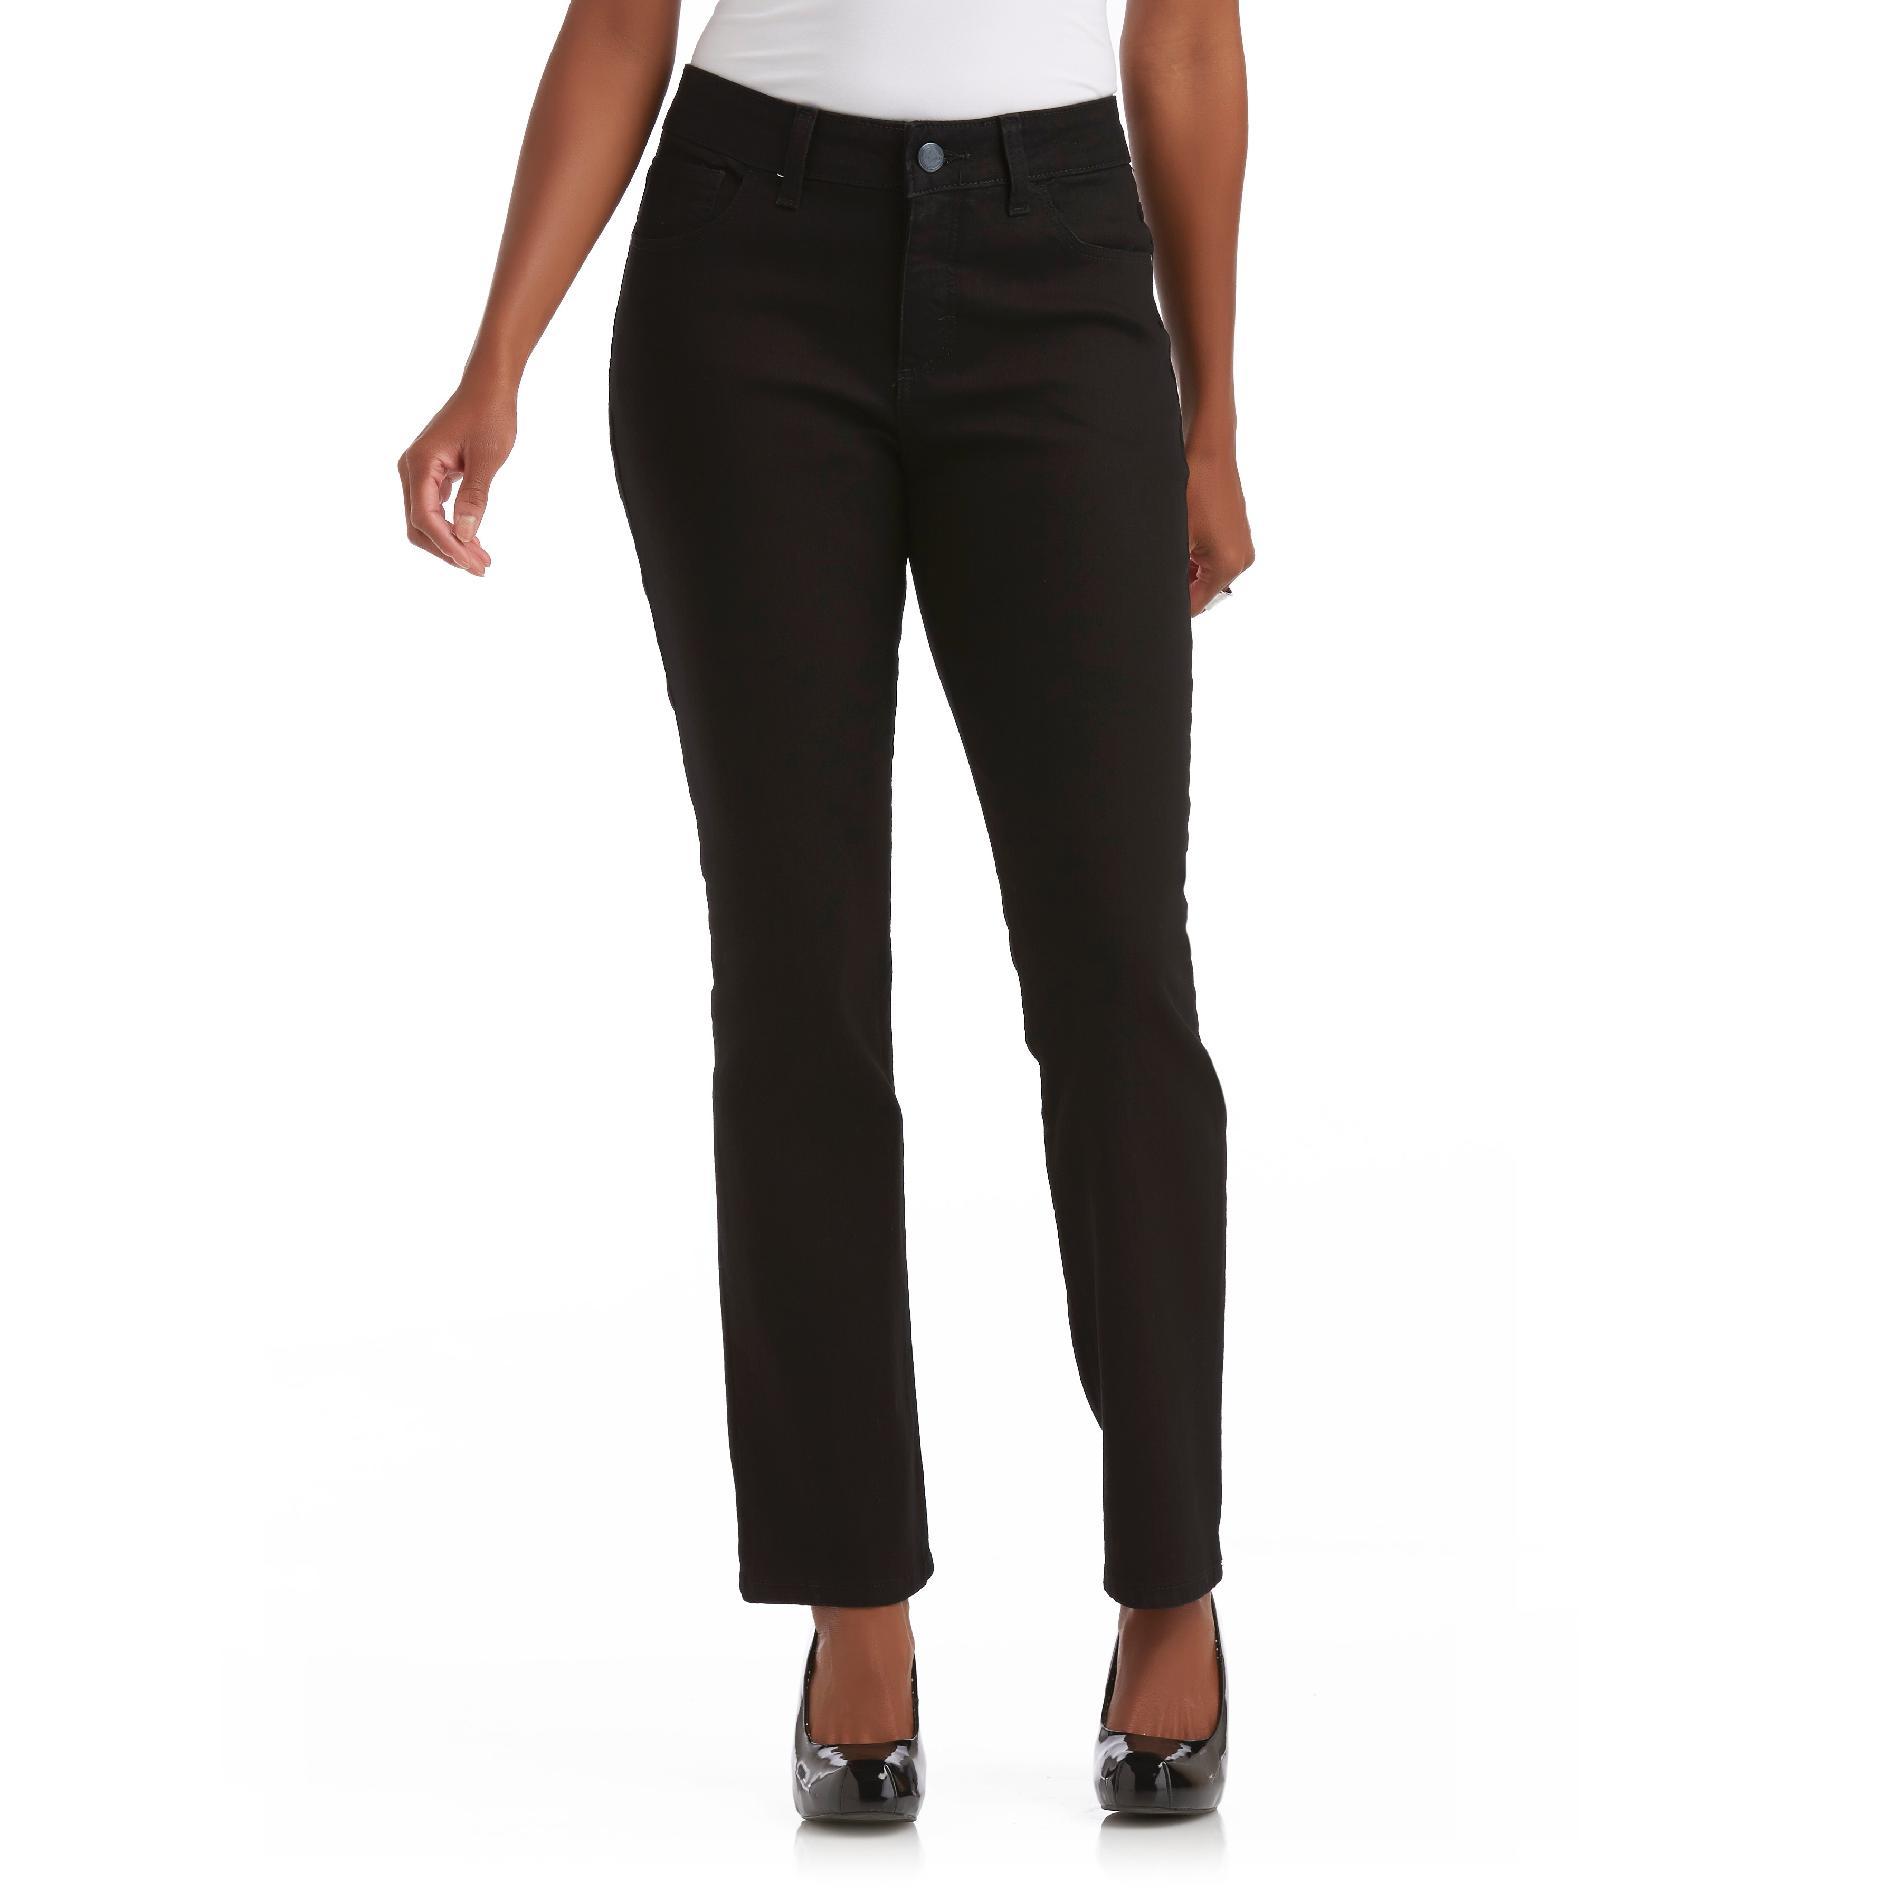 LEE Petite's Classic Fit Jeans